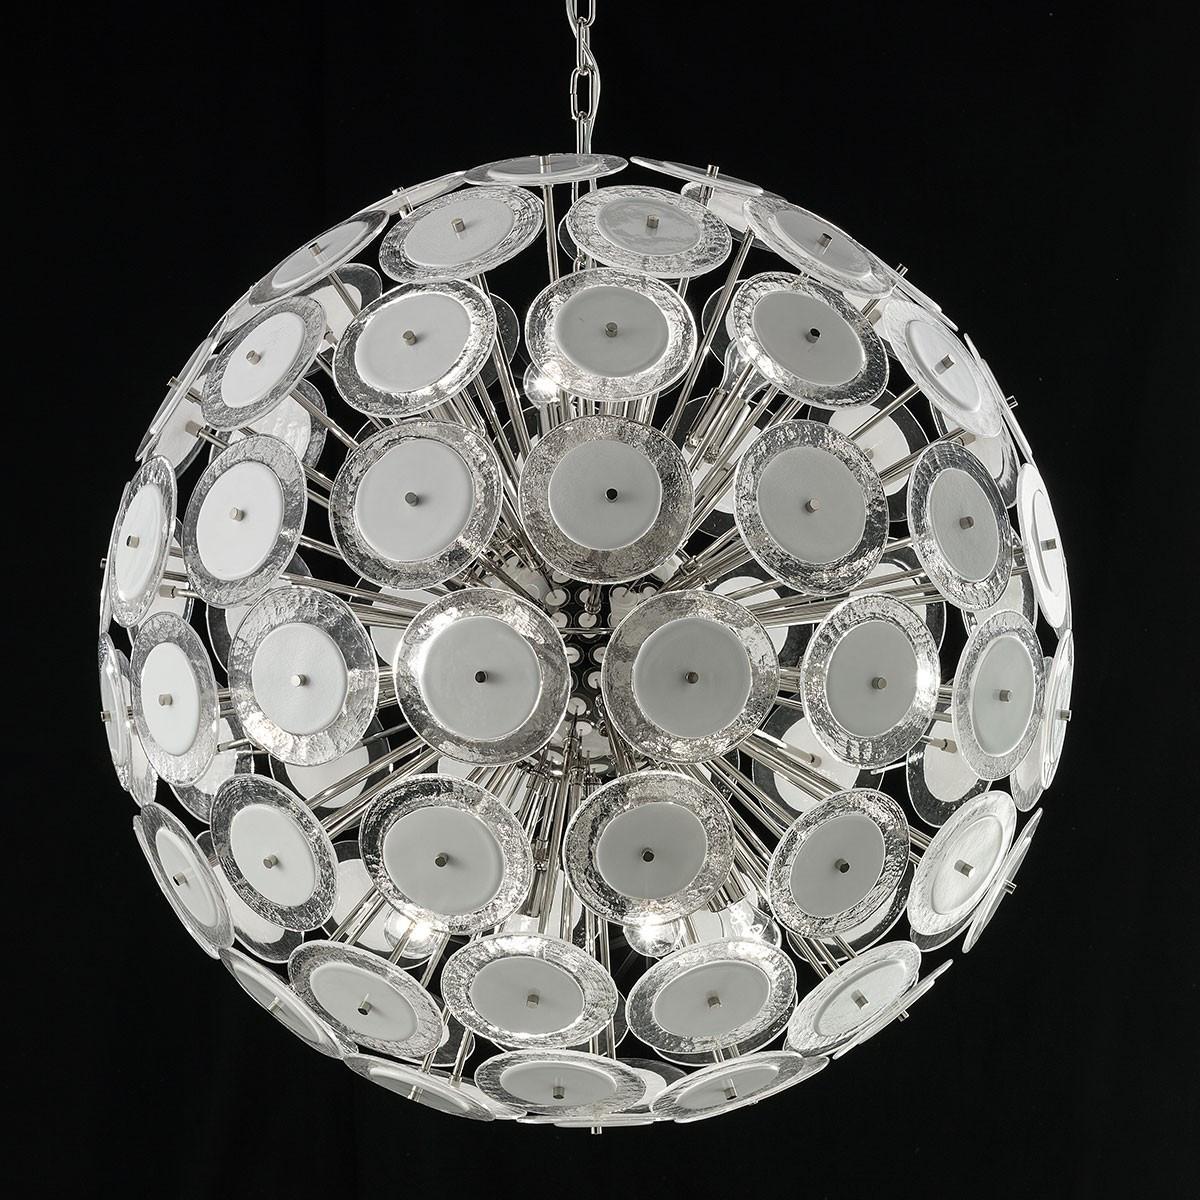 """Globo"" Murano glass chandelier - 12 lights - white and nickel"